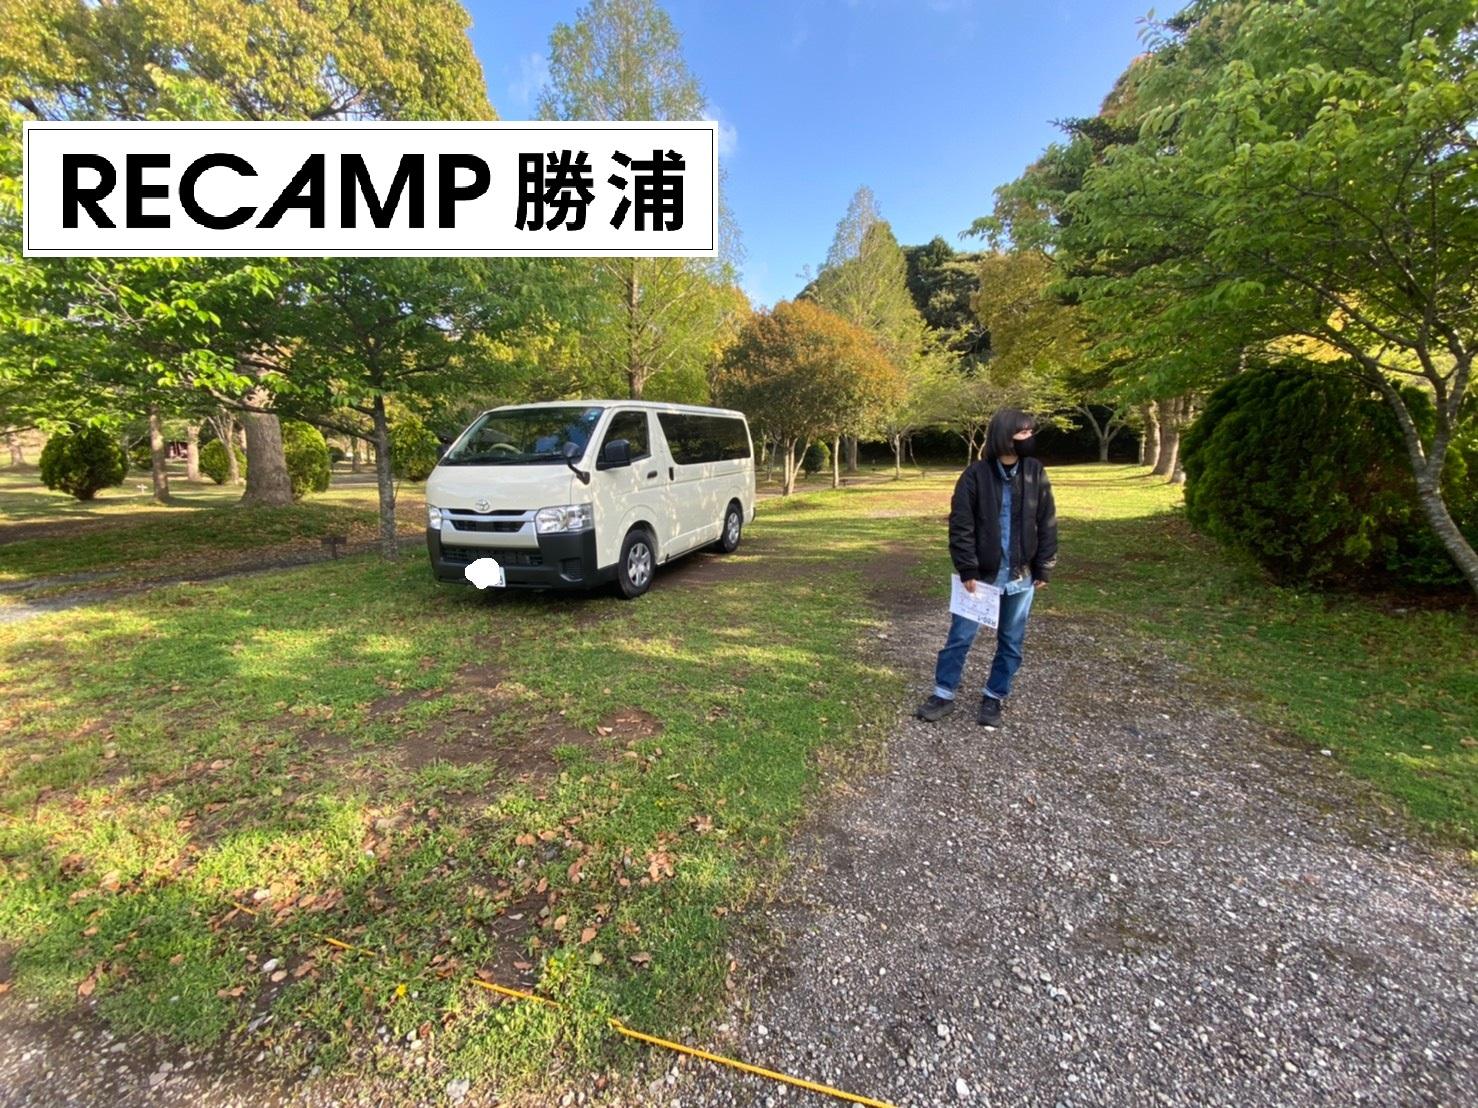 RECAMP勝浦で当日予約の贅沢な温泉キャンプ!